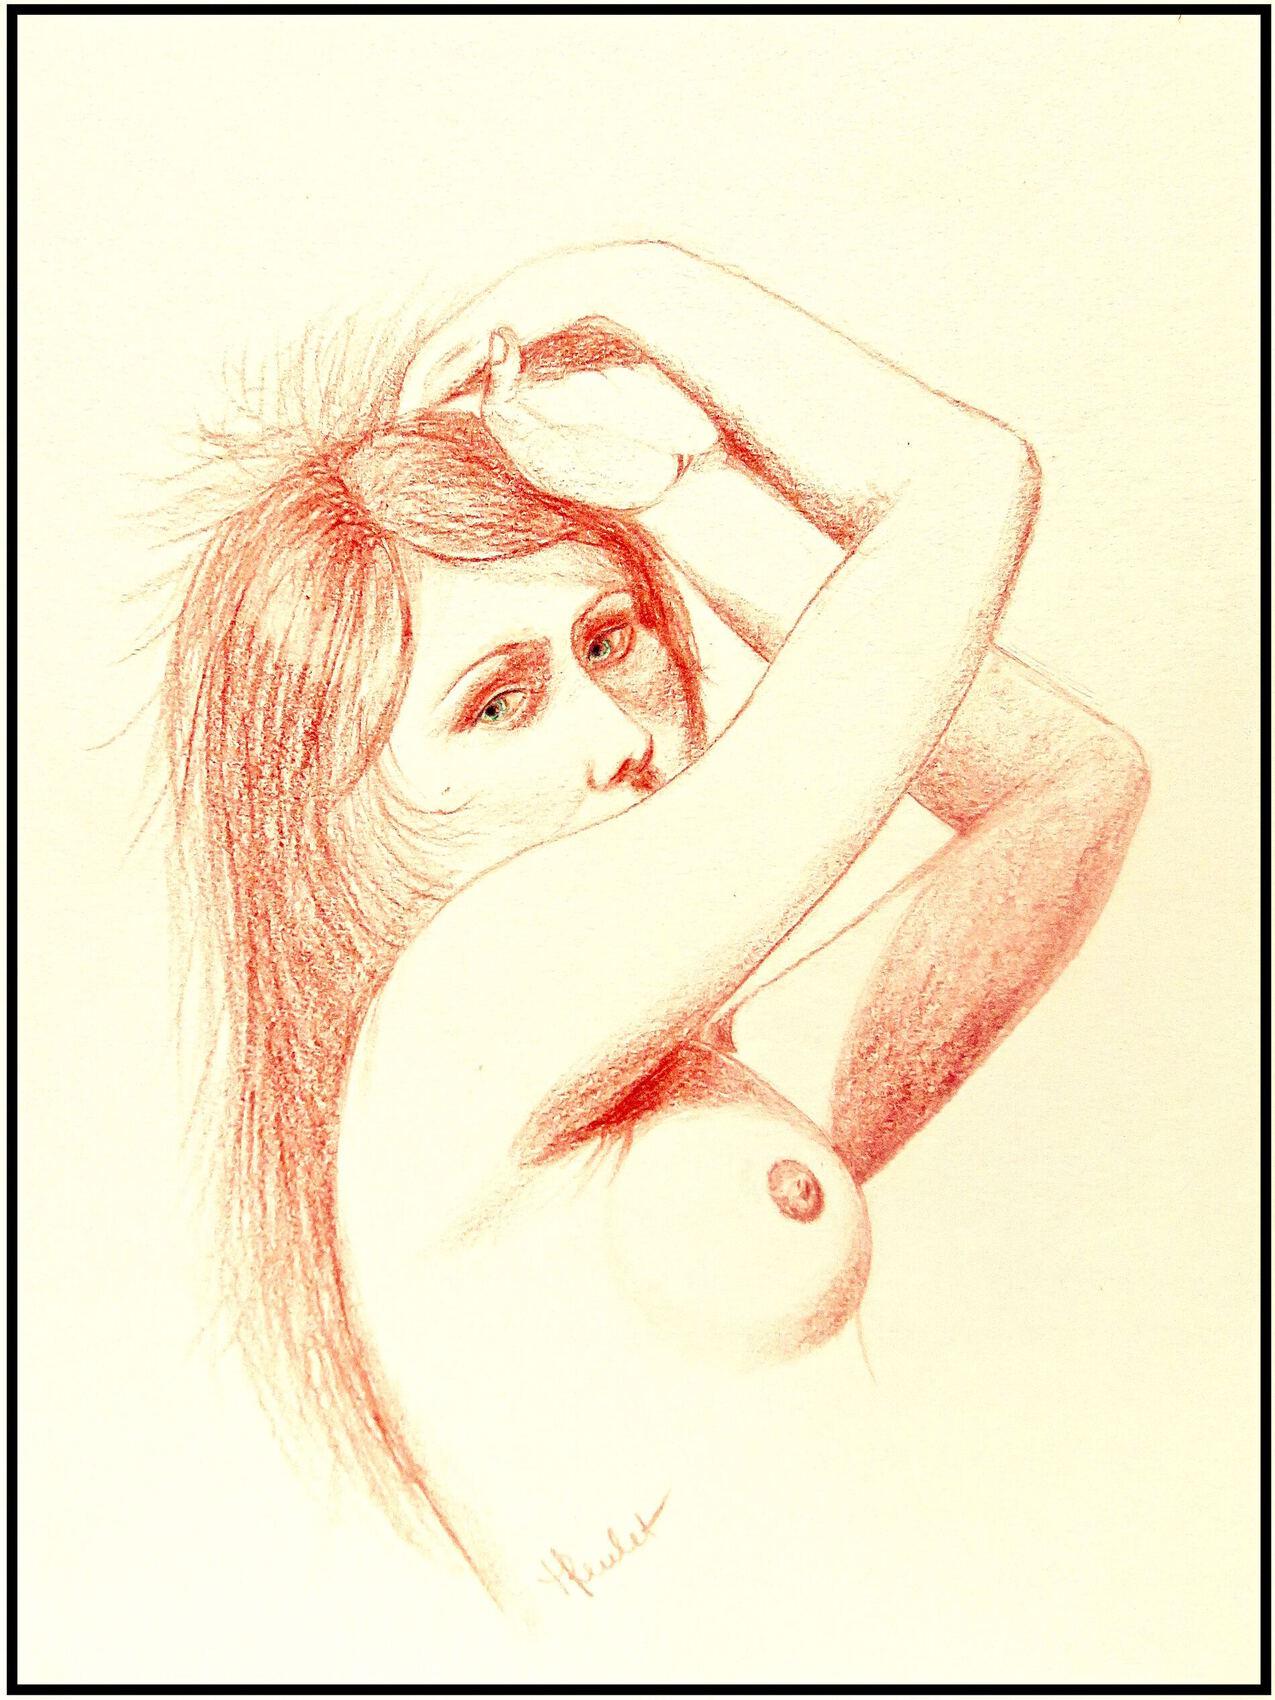 Femme allongée nue s'éveillant / Drawing Woman lying naked waking up